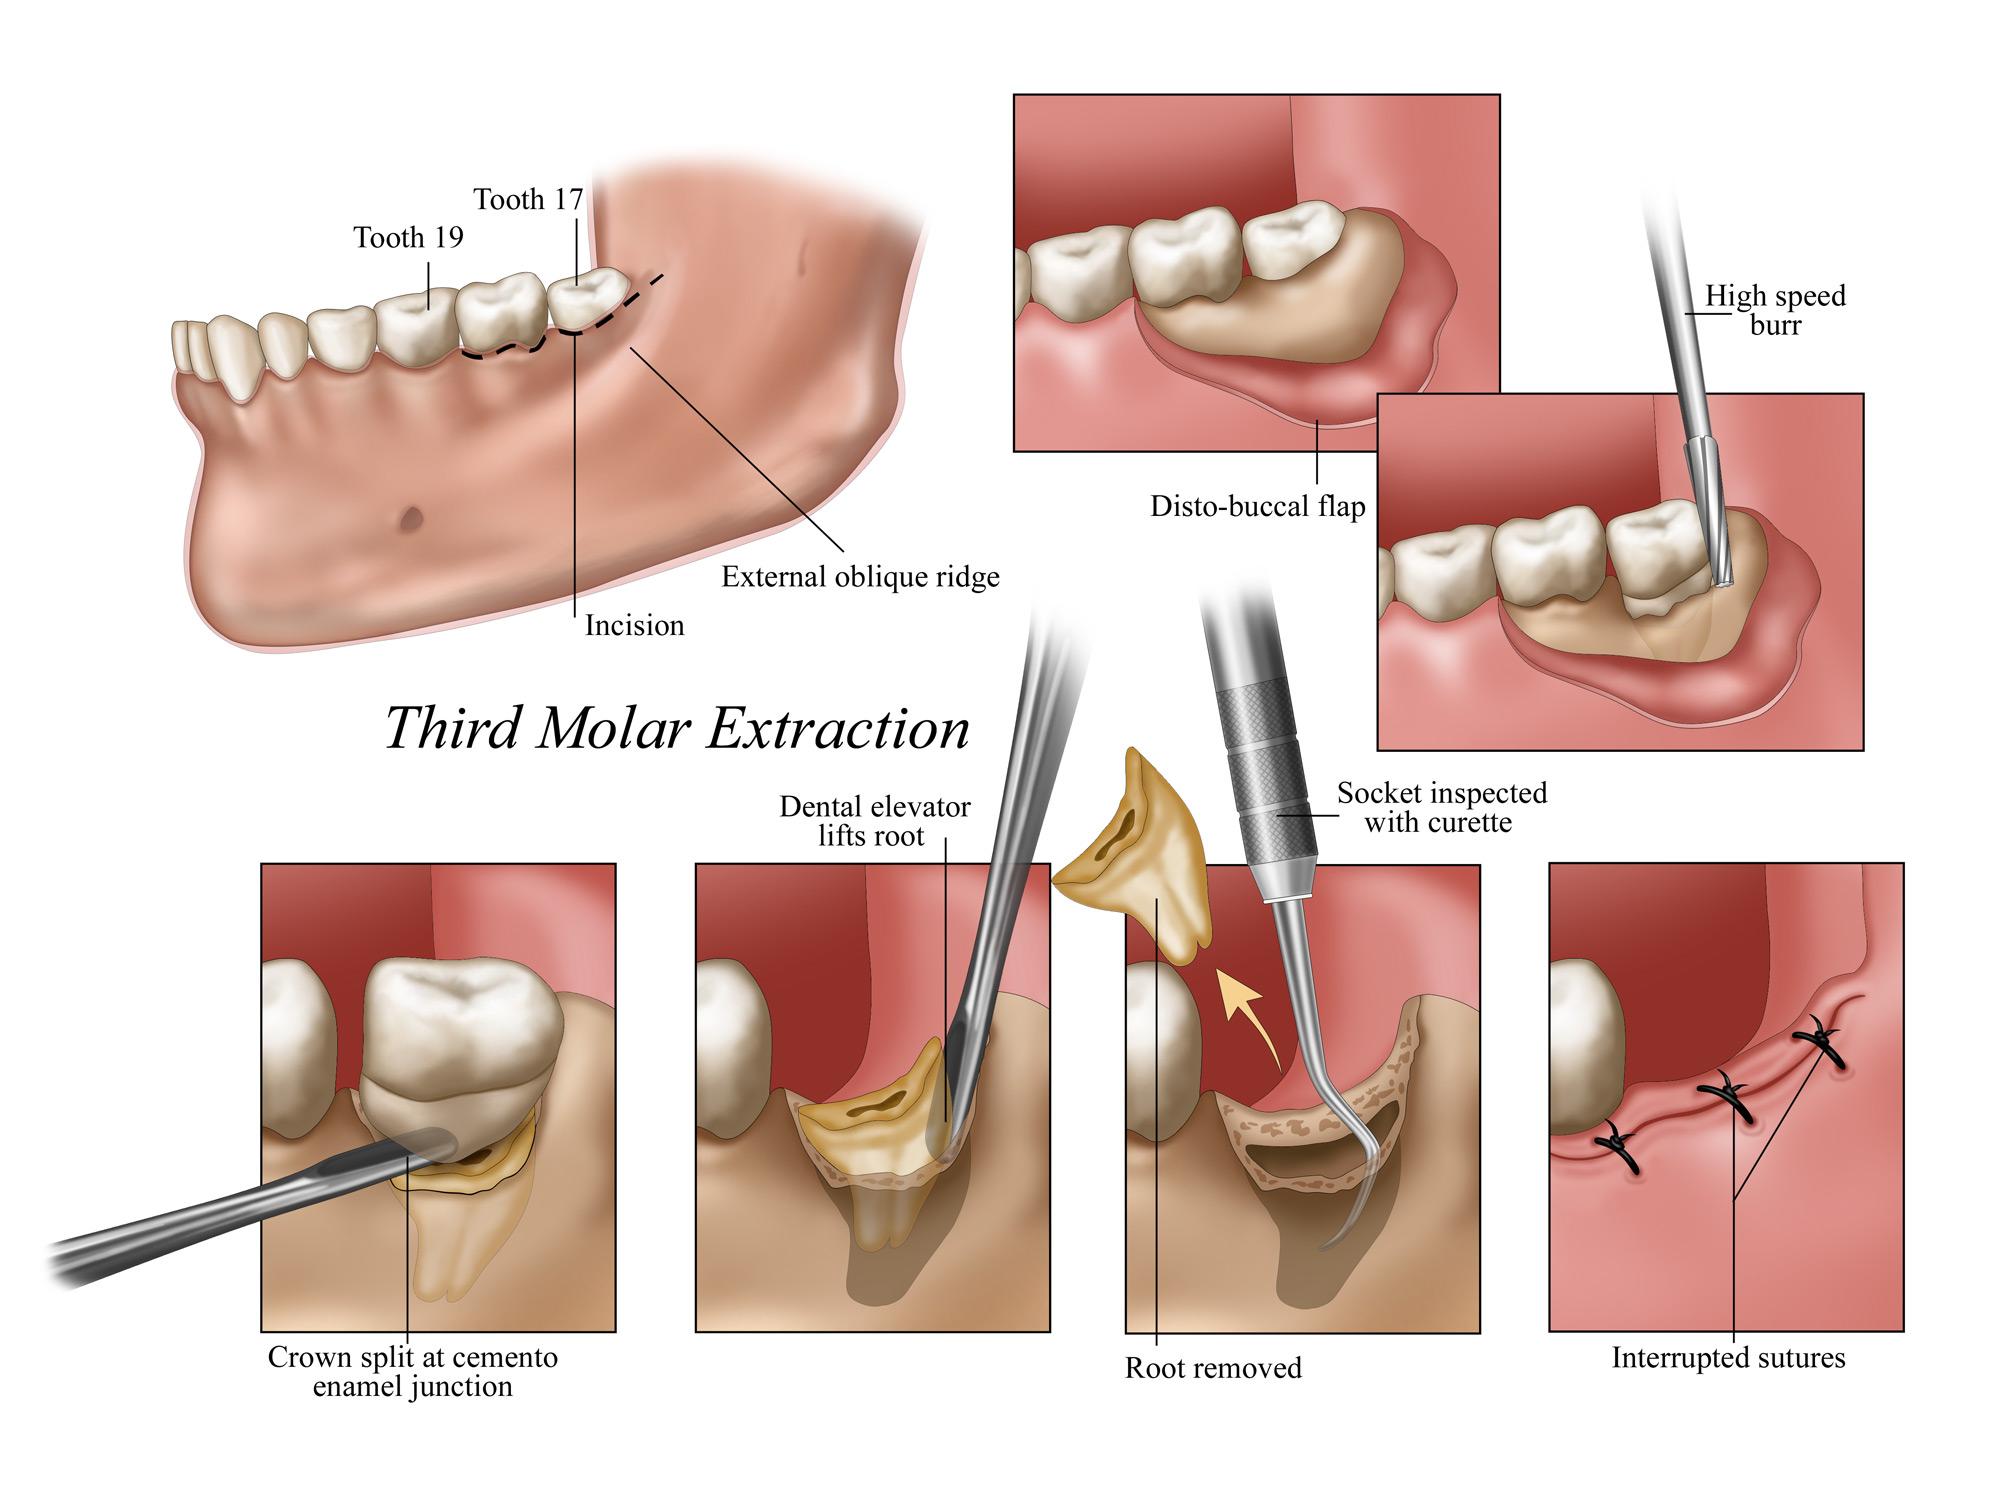 Third Molar Extraction